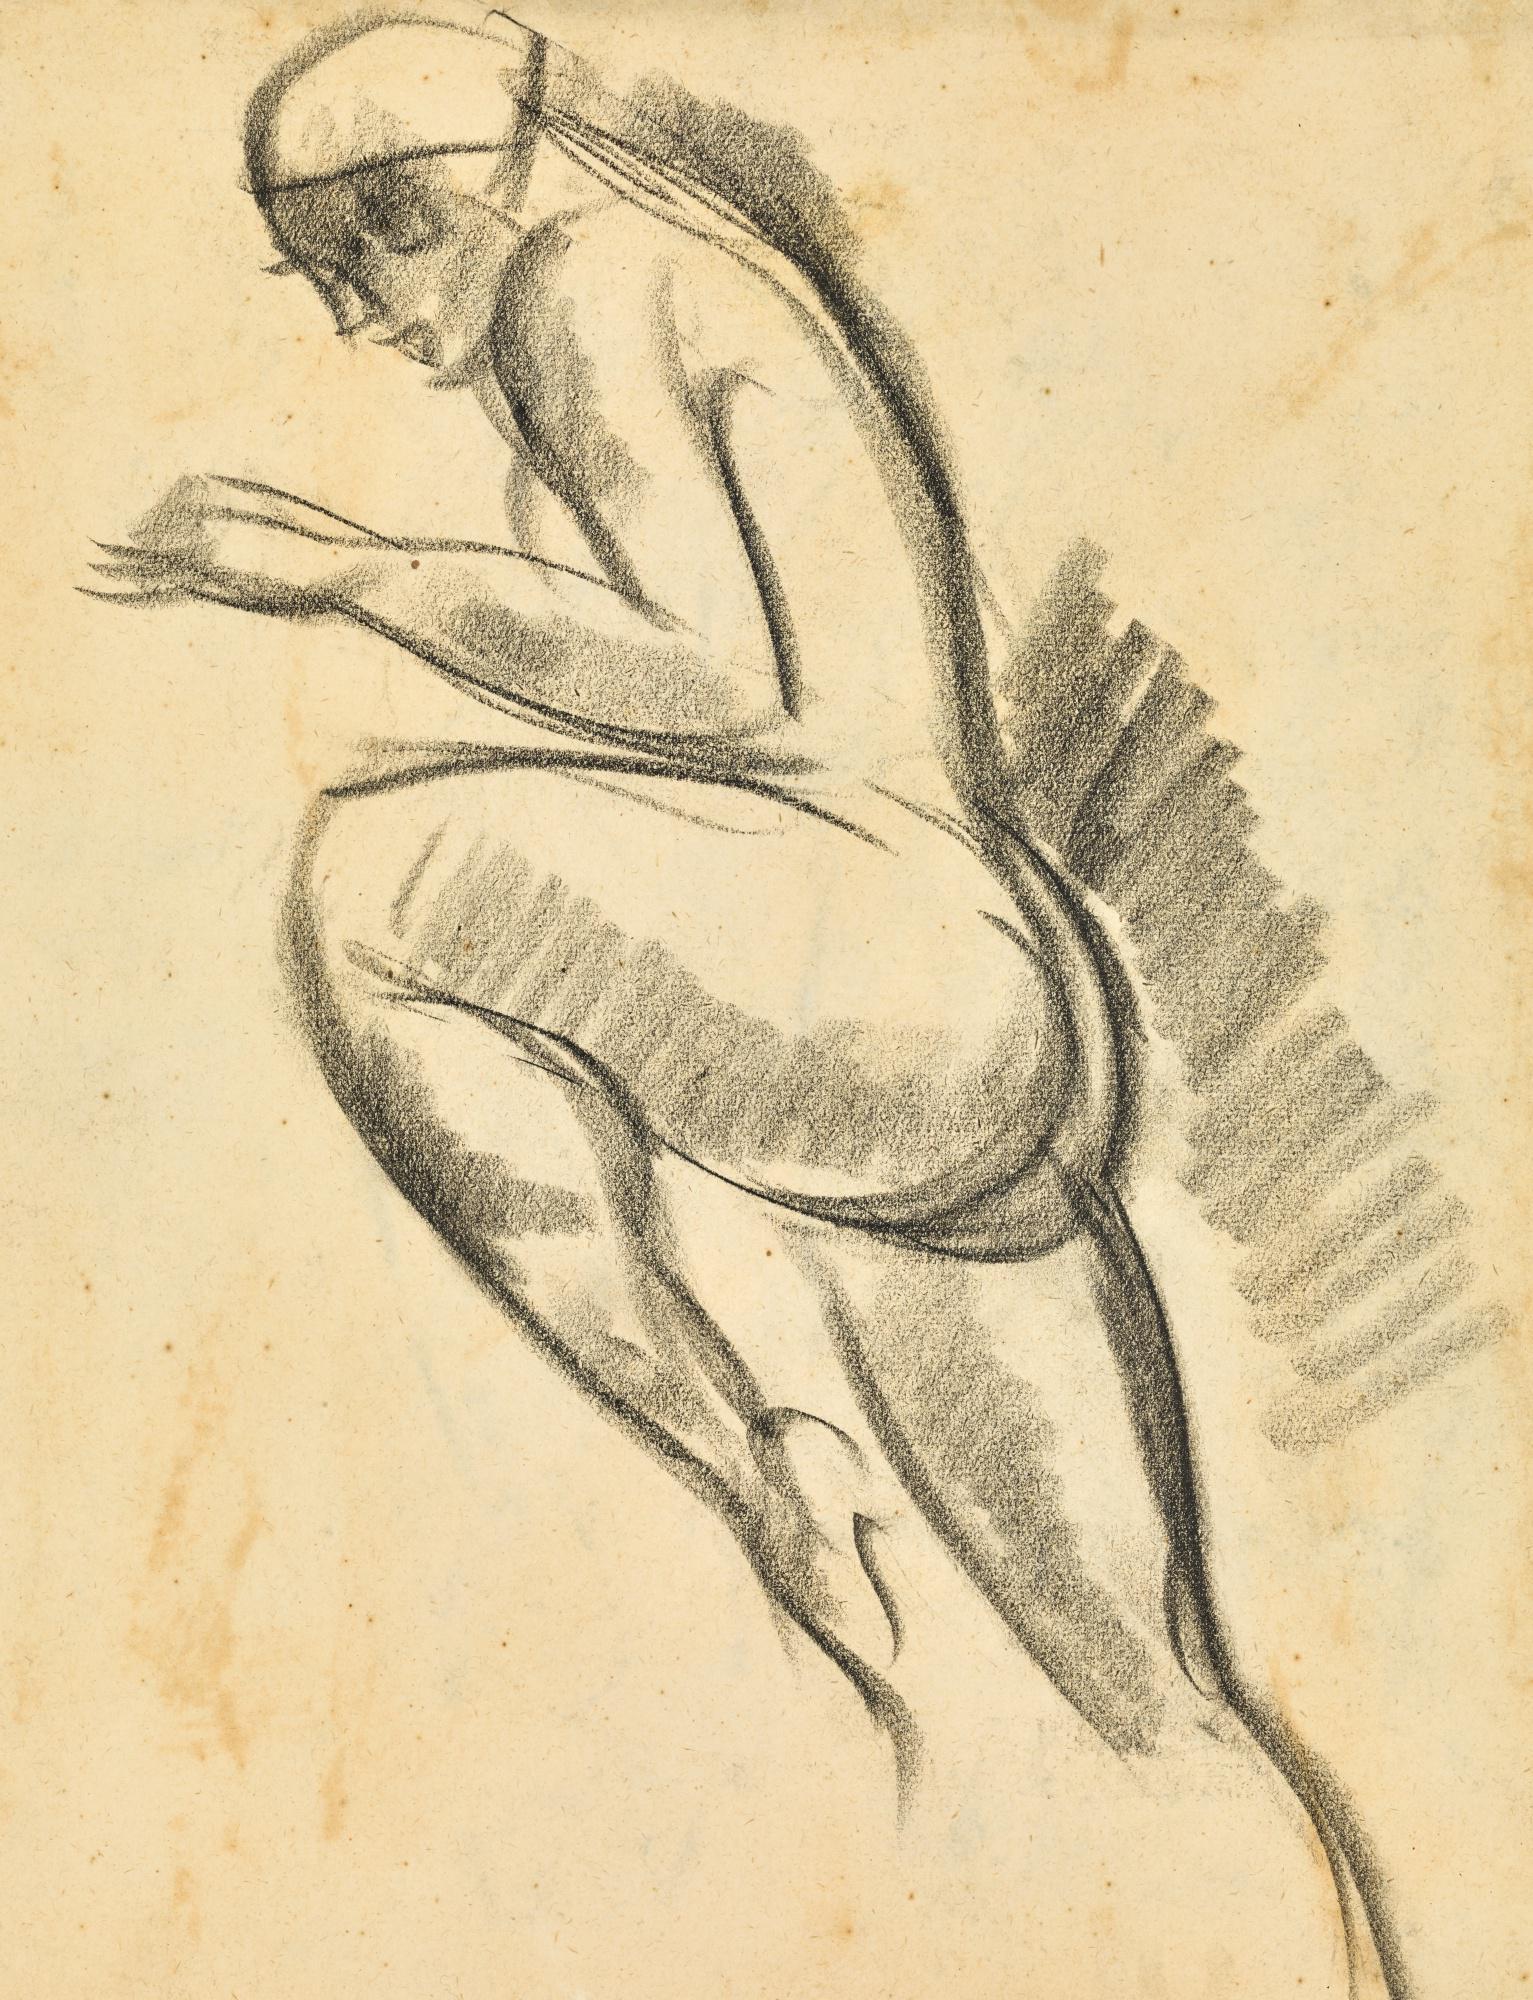 JOHN DUNCAN FERGUSSON, R.B.A. | STUDY OF A DANCER